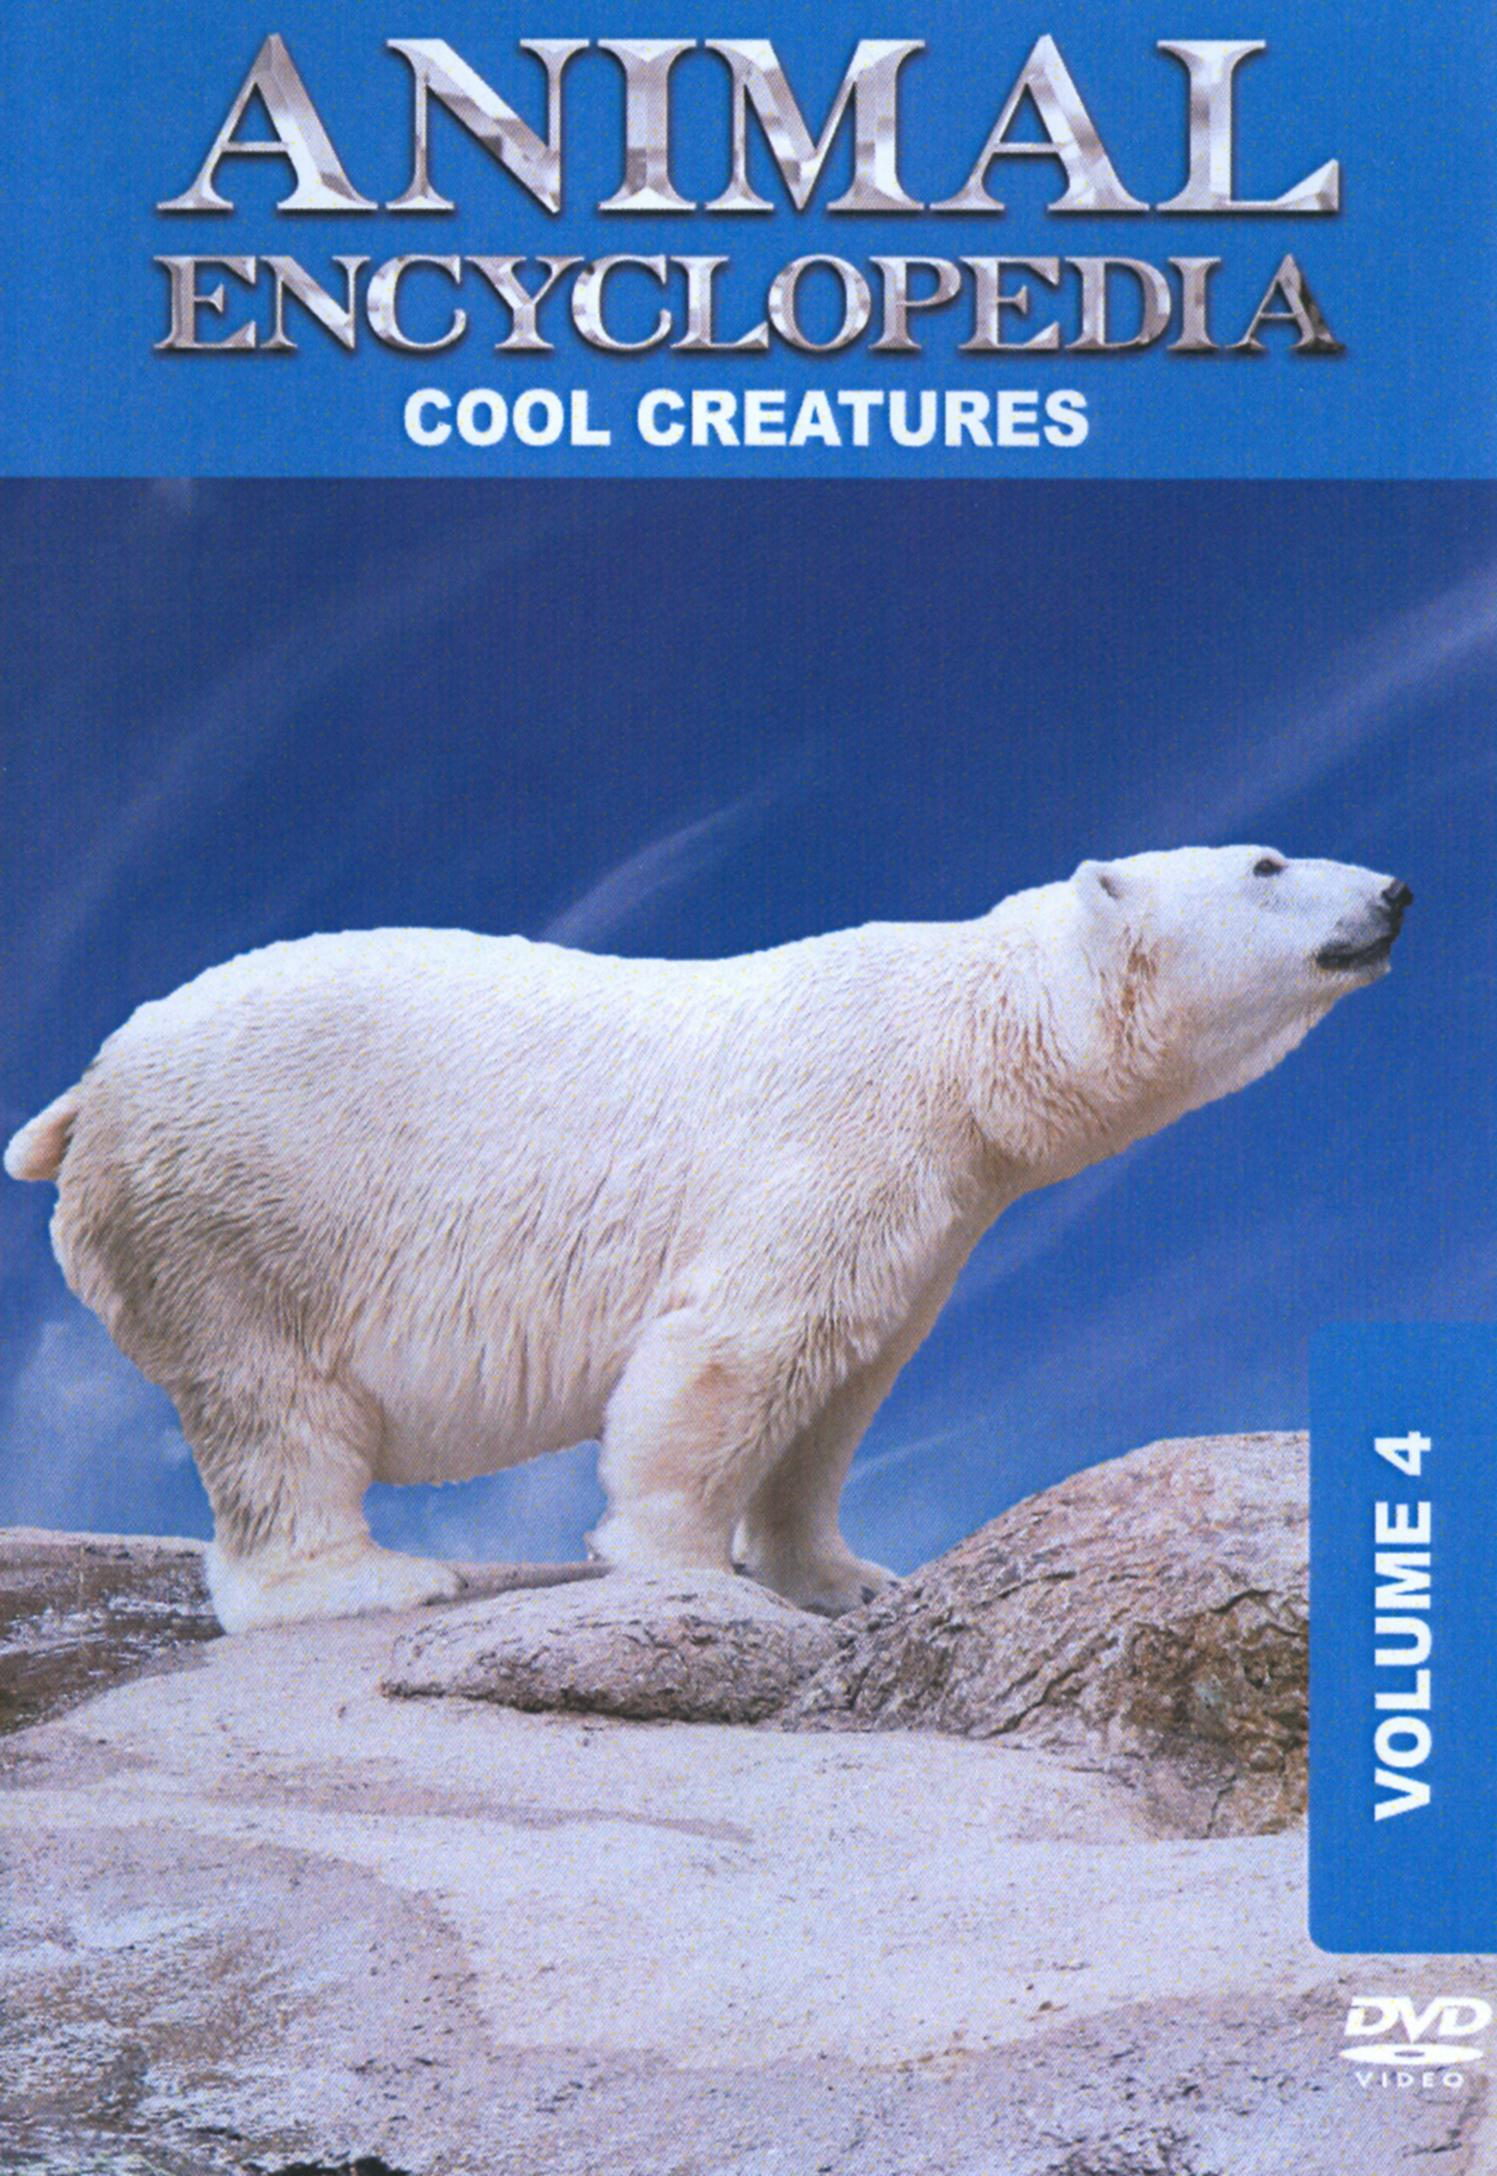 Animal Encyclopedia, Vol. 4: Cool Creatures